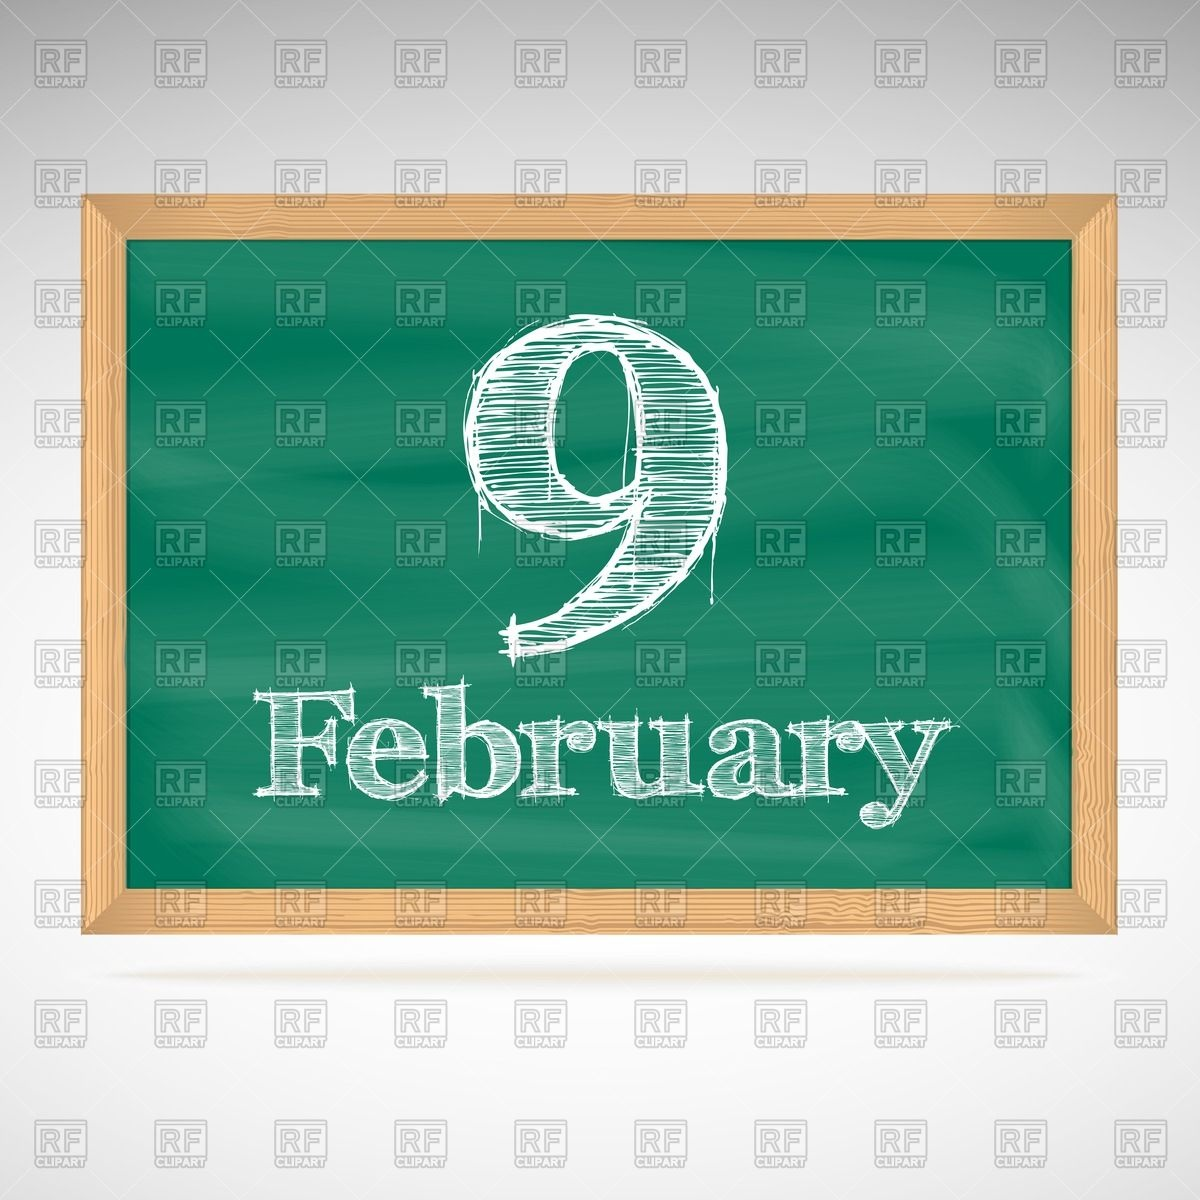 Free february calendar clipart stock February Calendar Clipart - Clipart Kid stock